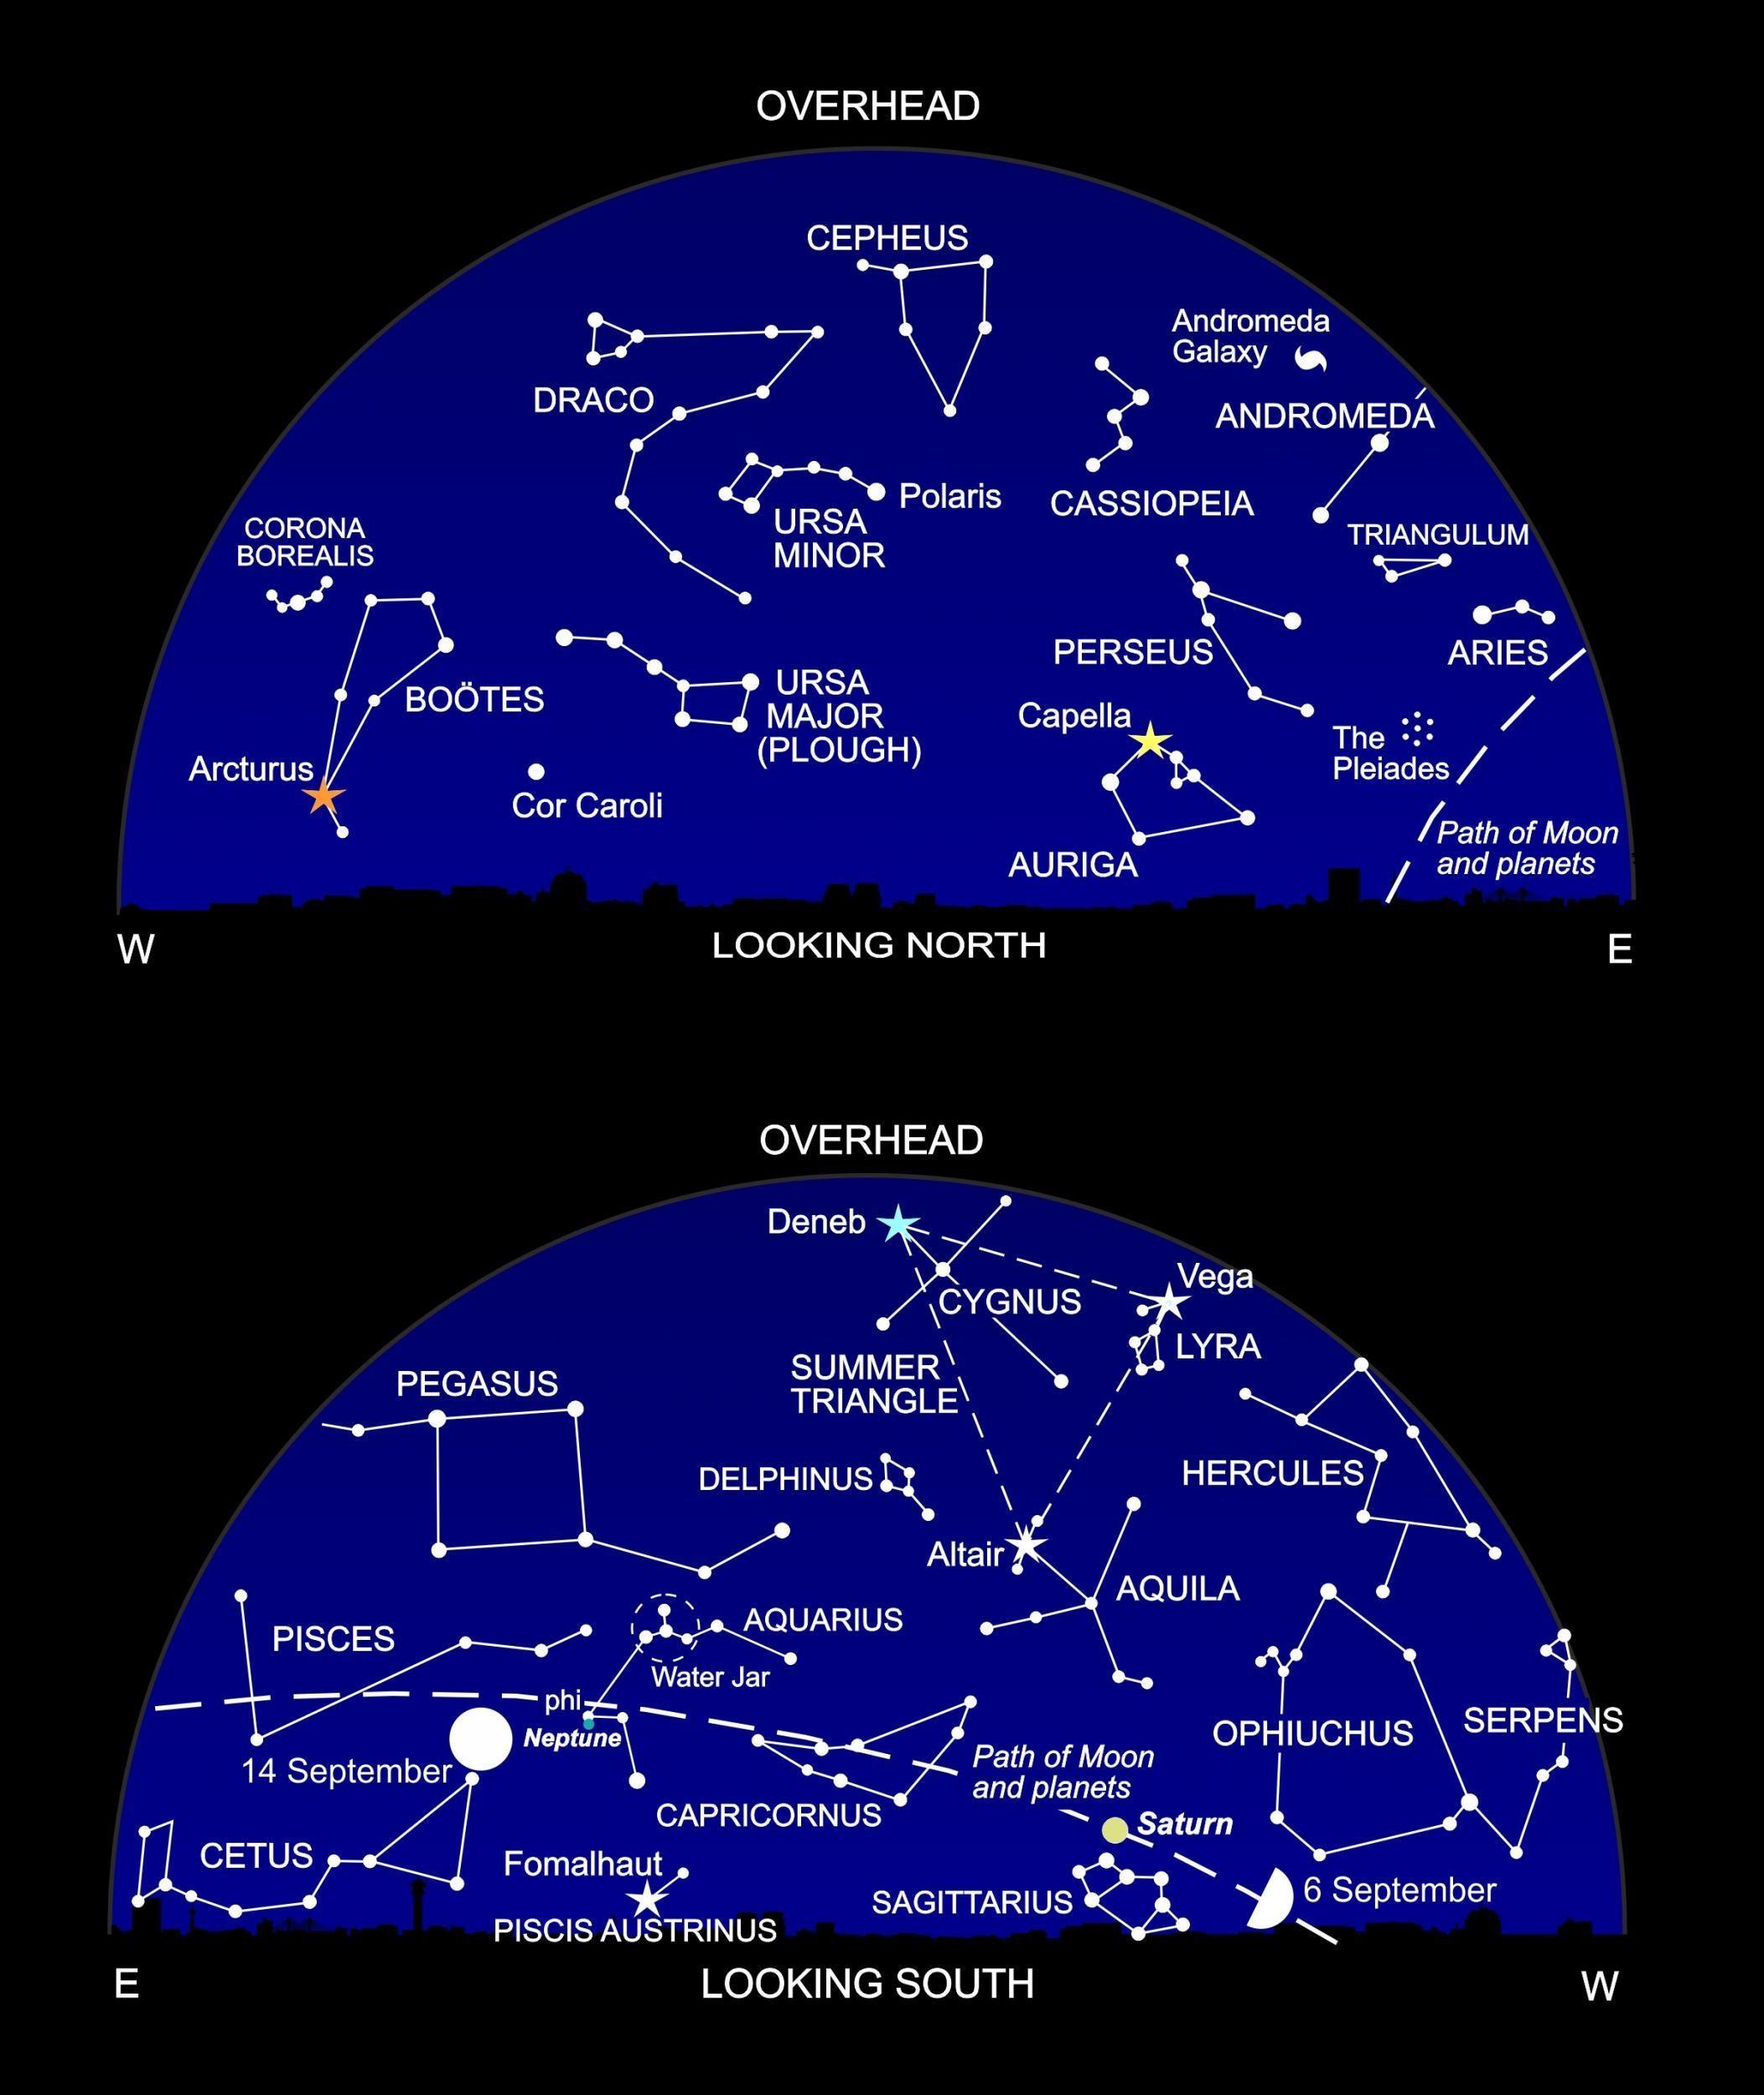 Stargazing in September: Neptune is a world in the twilight